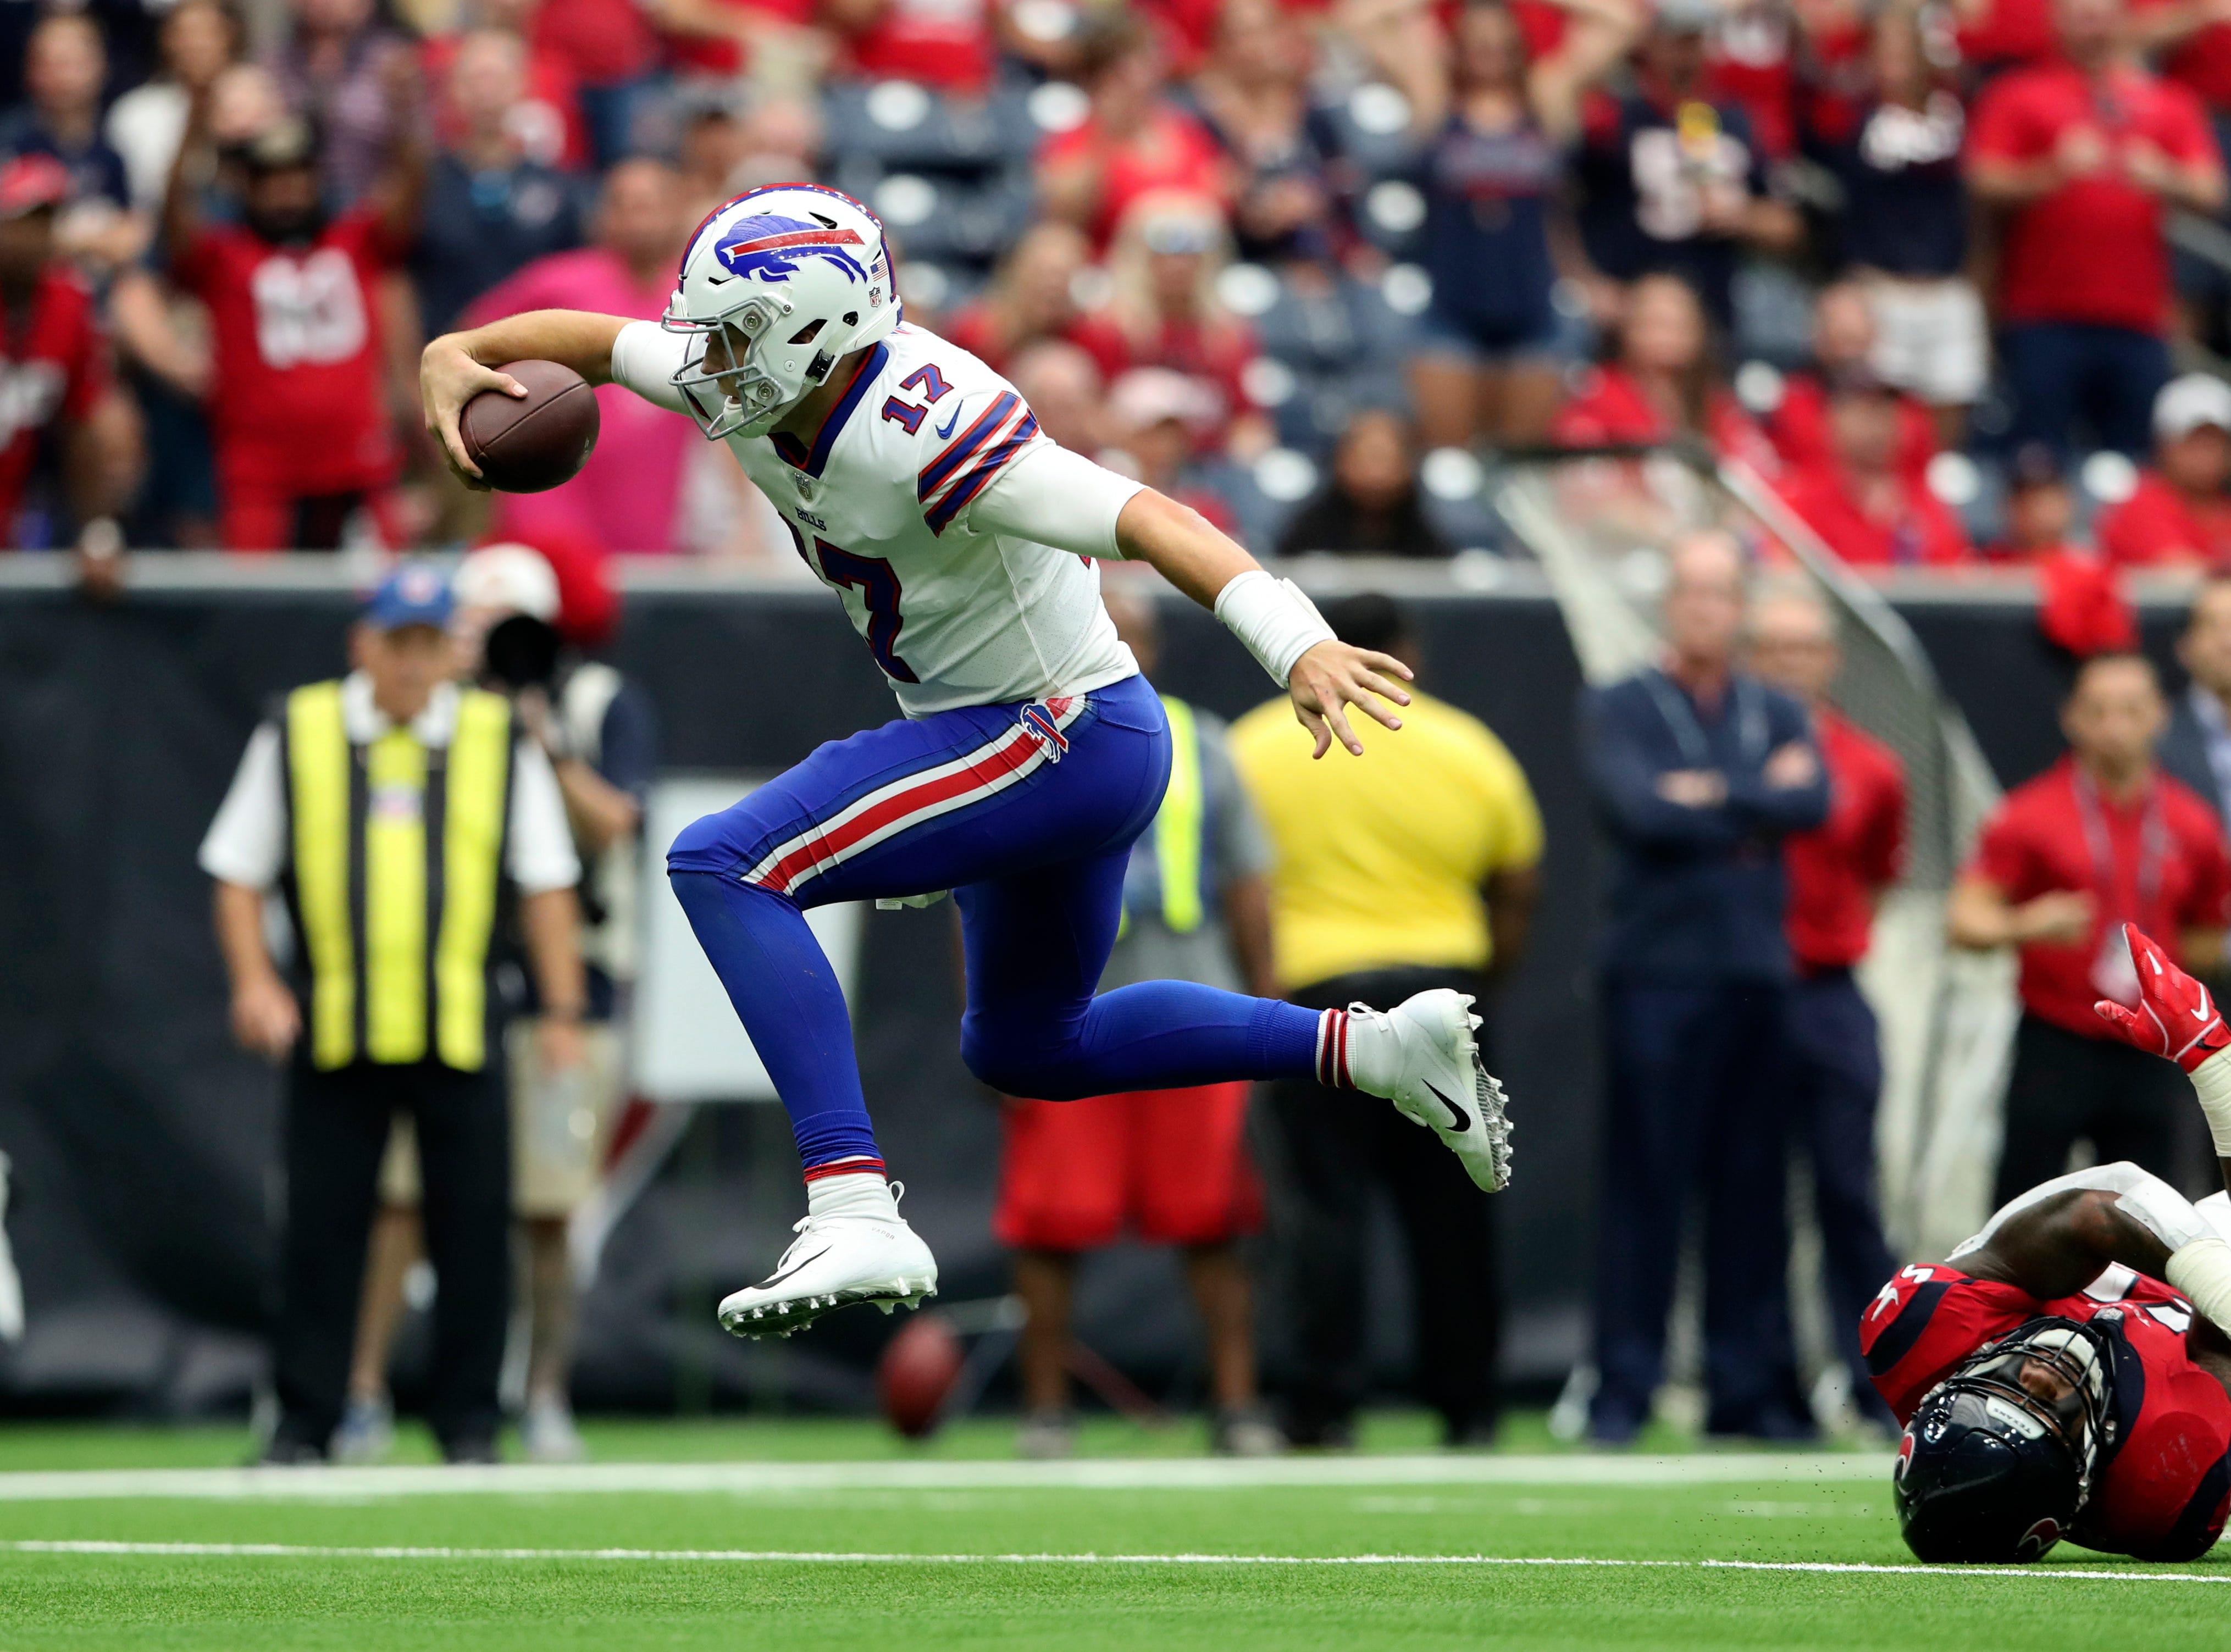 Oct 14, 2018; Houston, TX, USA; Buffalo Bills quarterback Josh Allen (17) jumps during the second half while running against the Houston Texans at NRG Stadium. Mandatory Credit: Kevin Jairaj-USA TODAY Sports